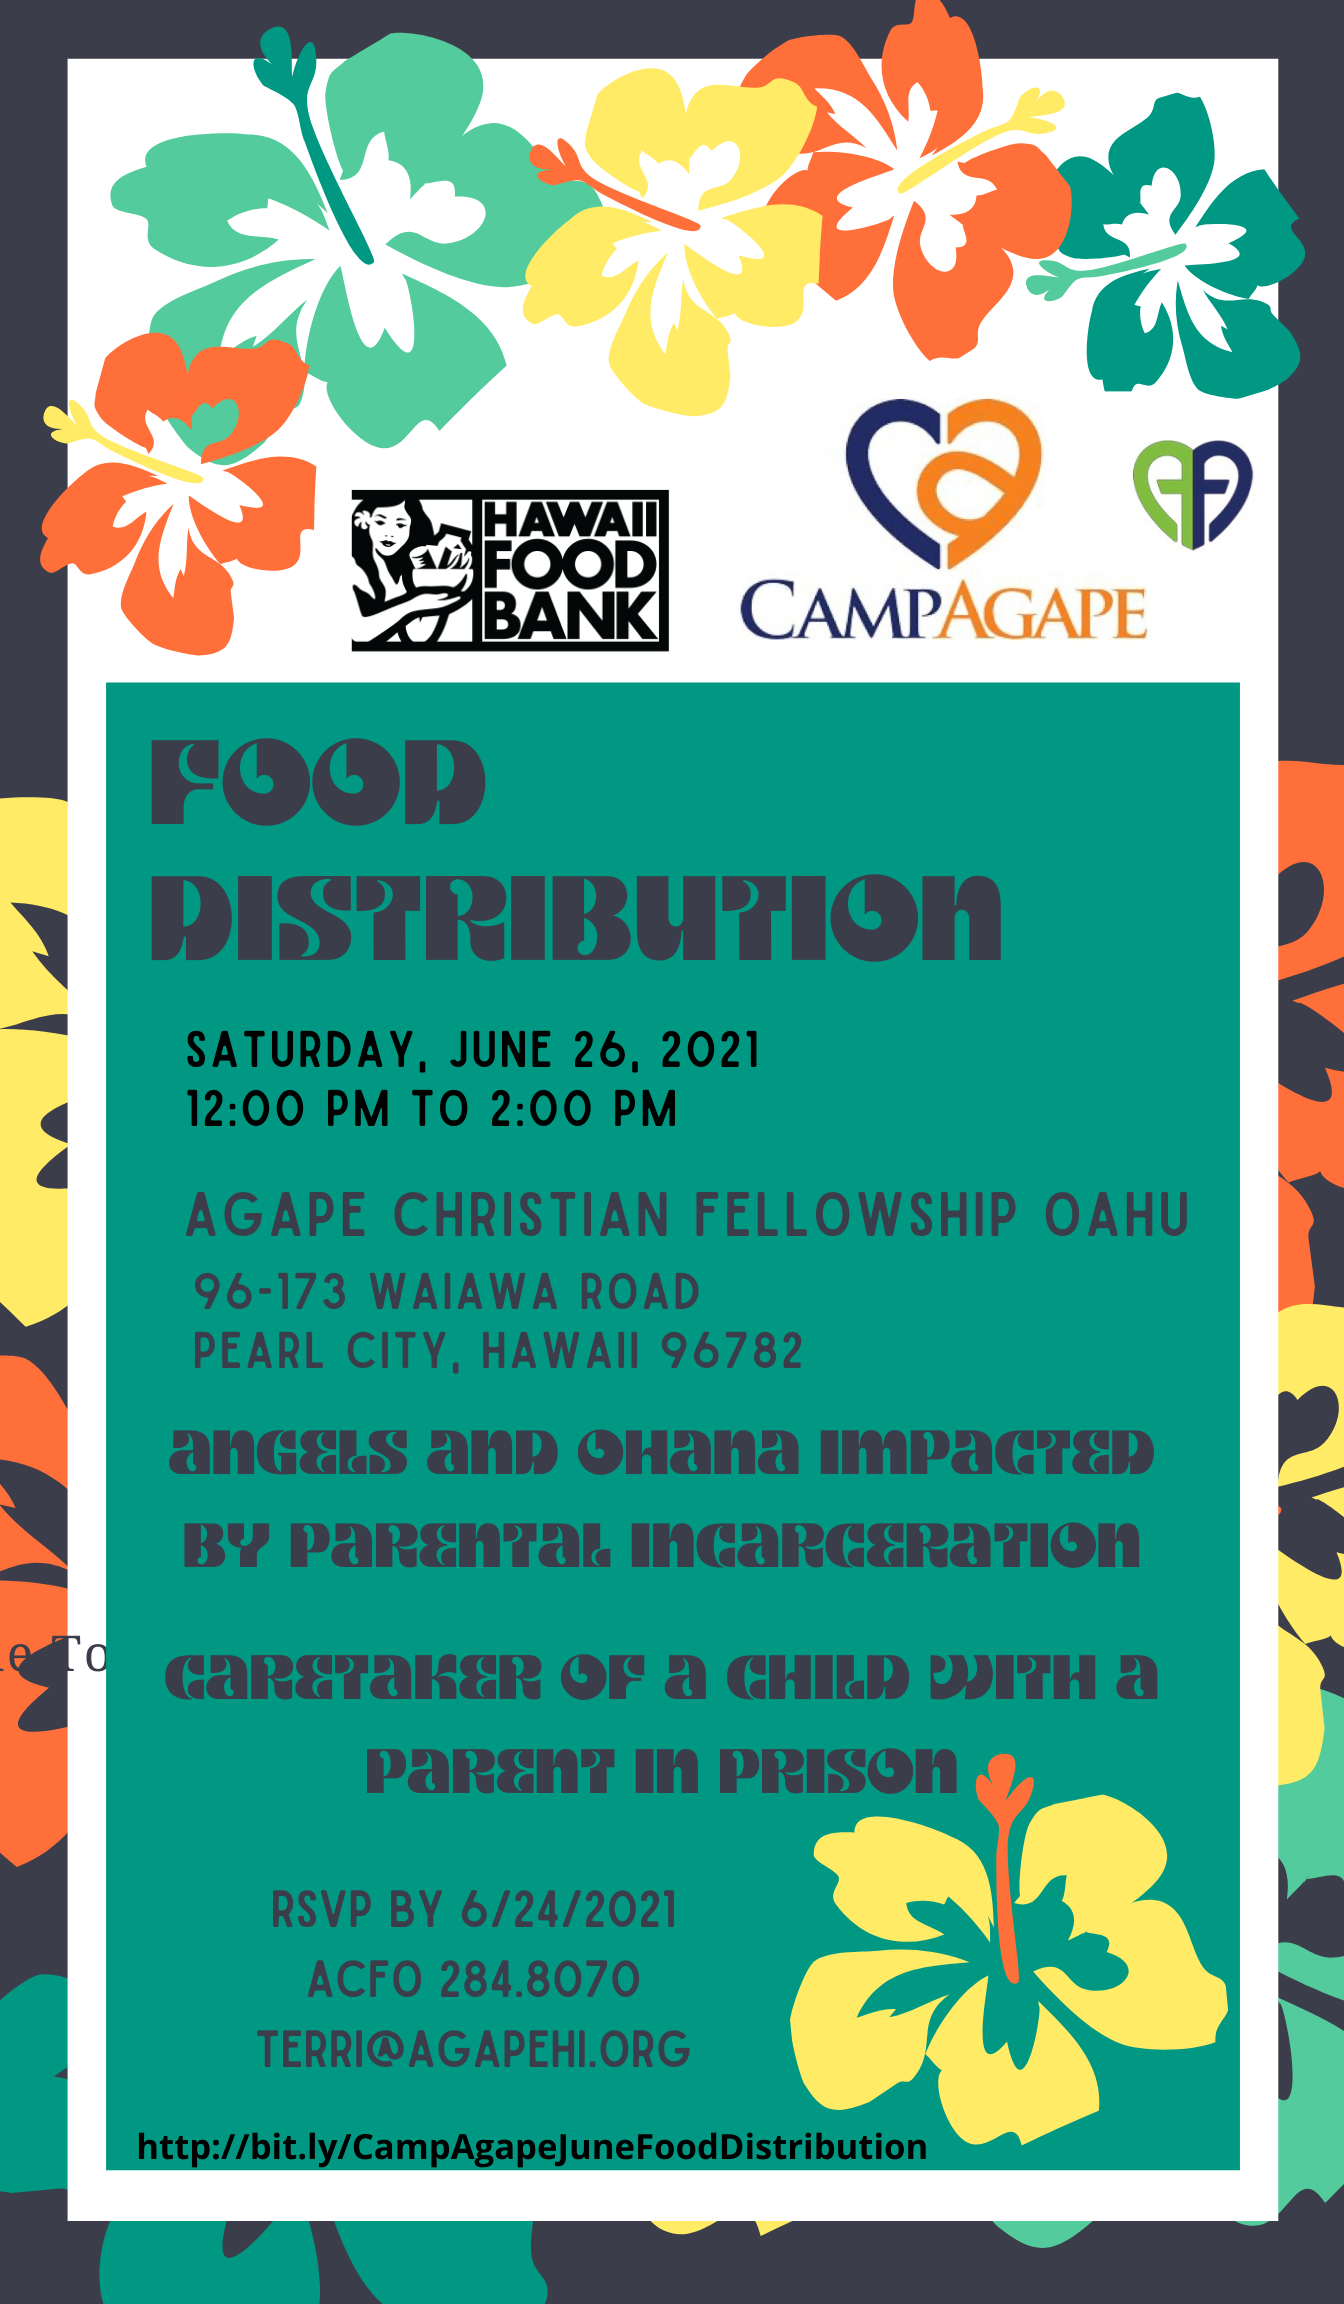 June 26, 2021 Agape Food Distribution